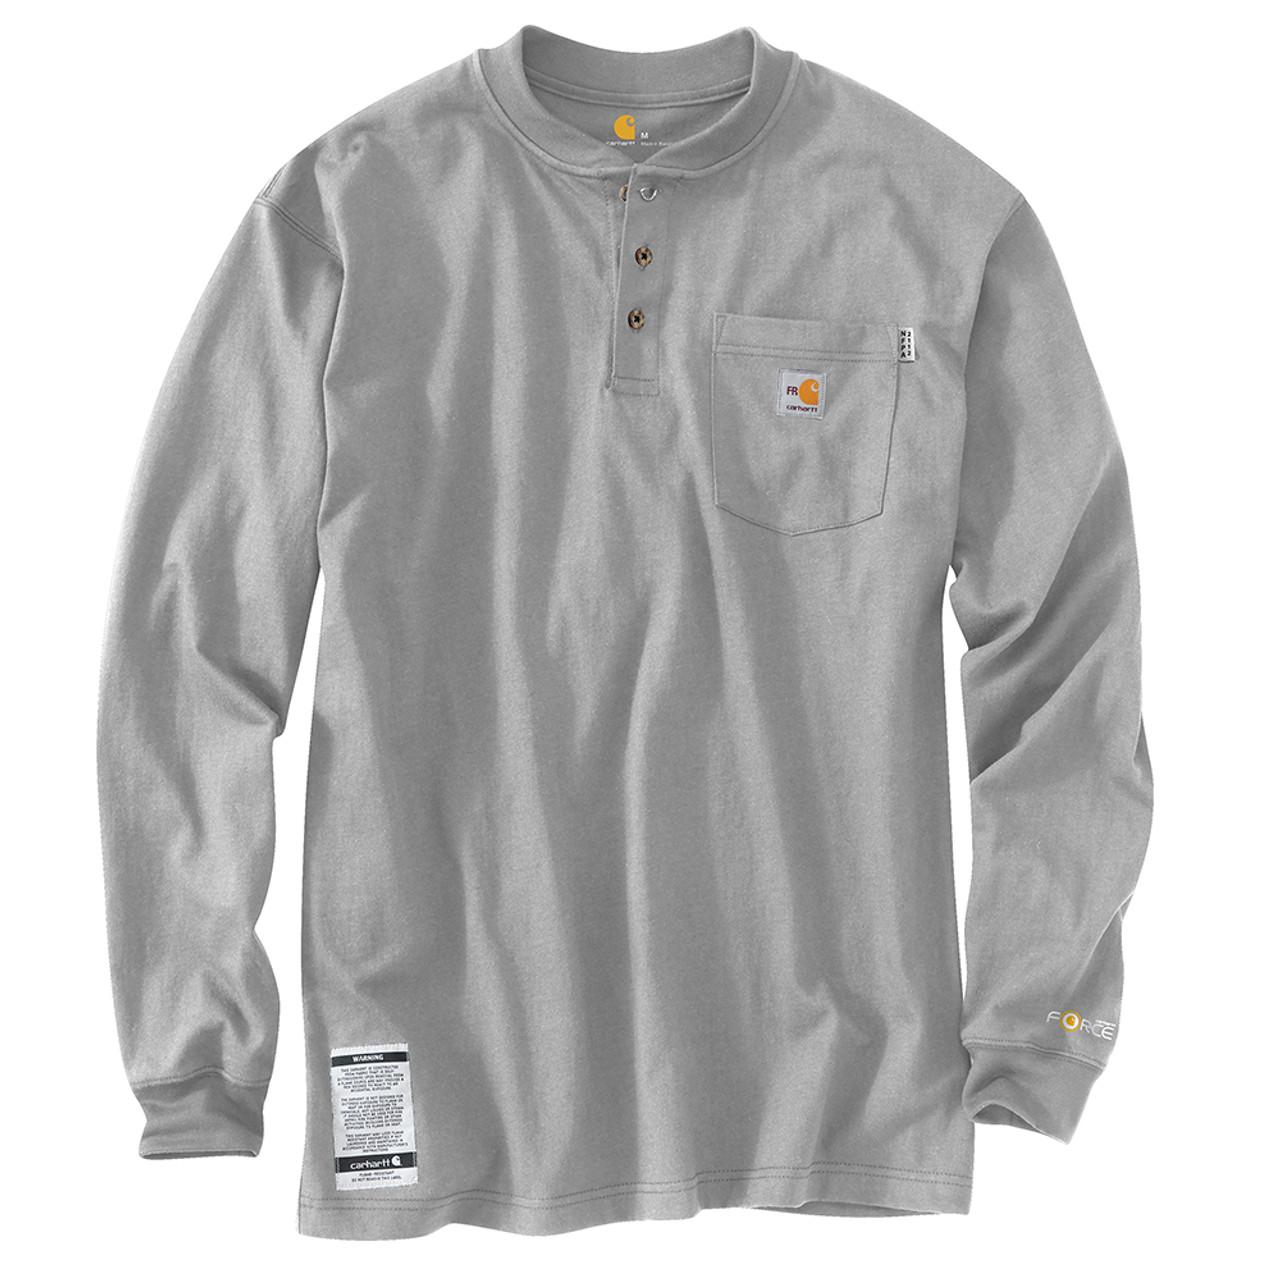 23443ea16 Carhartt 8.9 Men's Flame Resistant Force Cotton Long Sleeve Henley - 100237